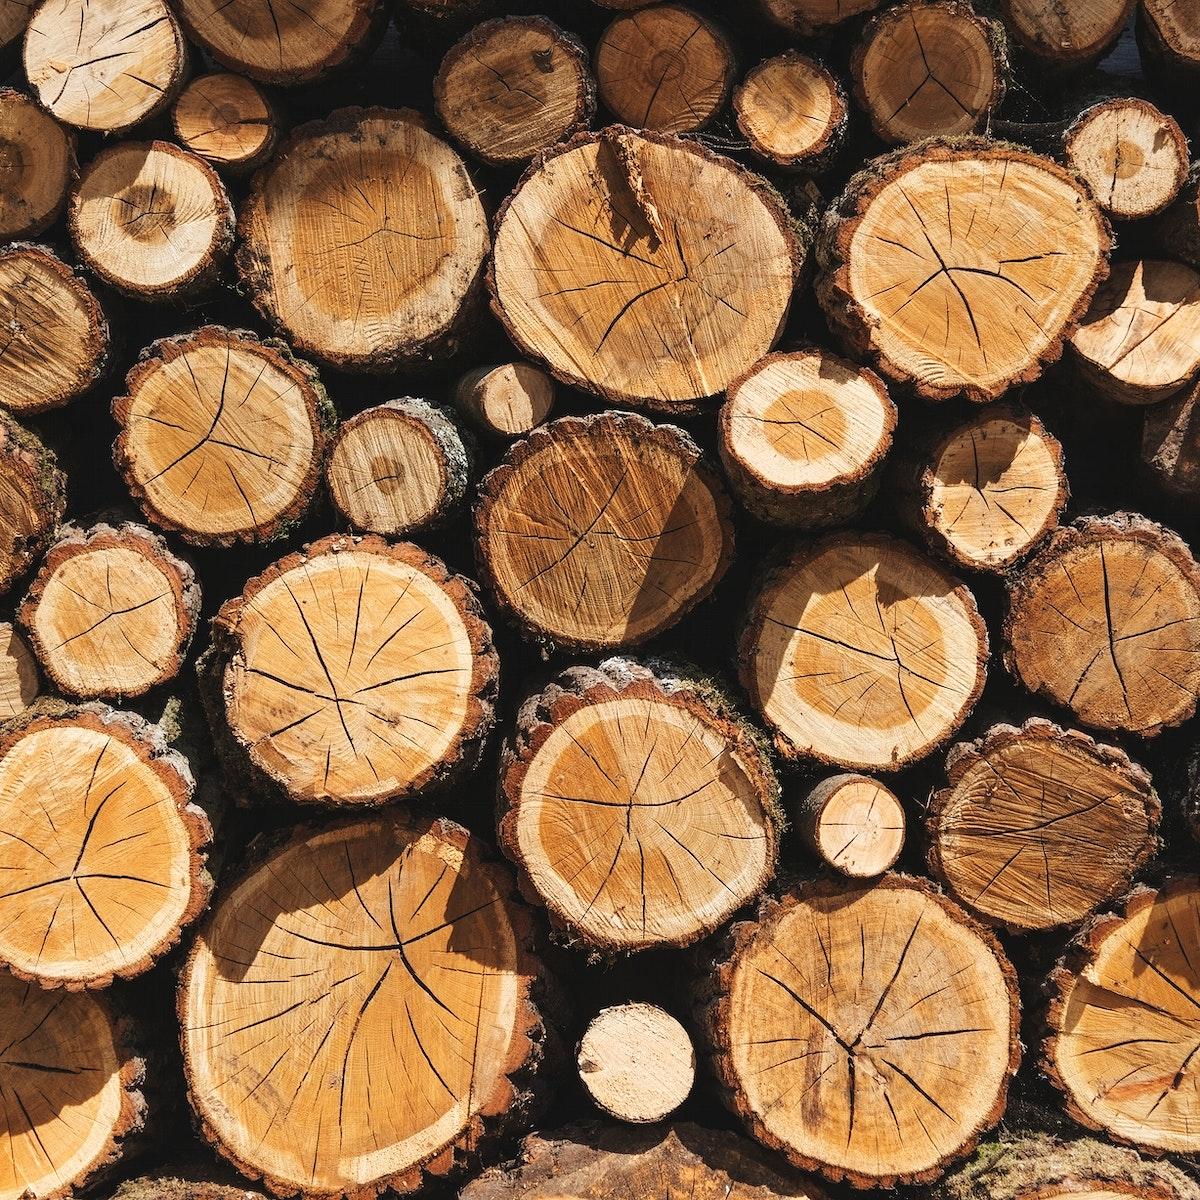 Stacks of timber